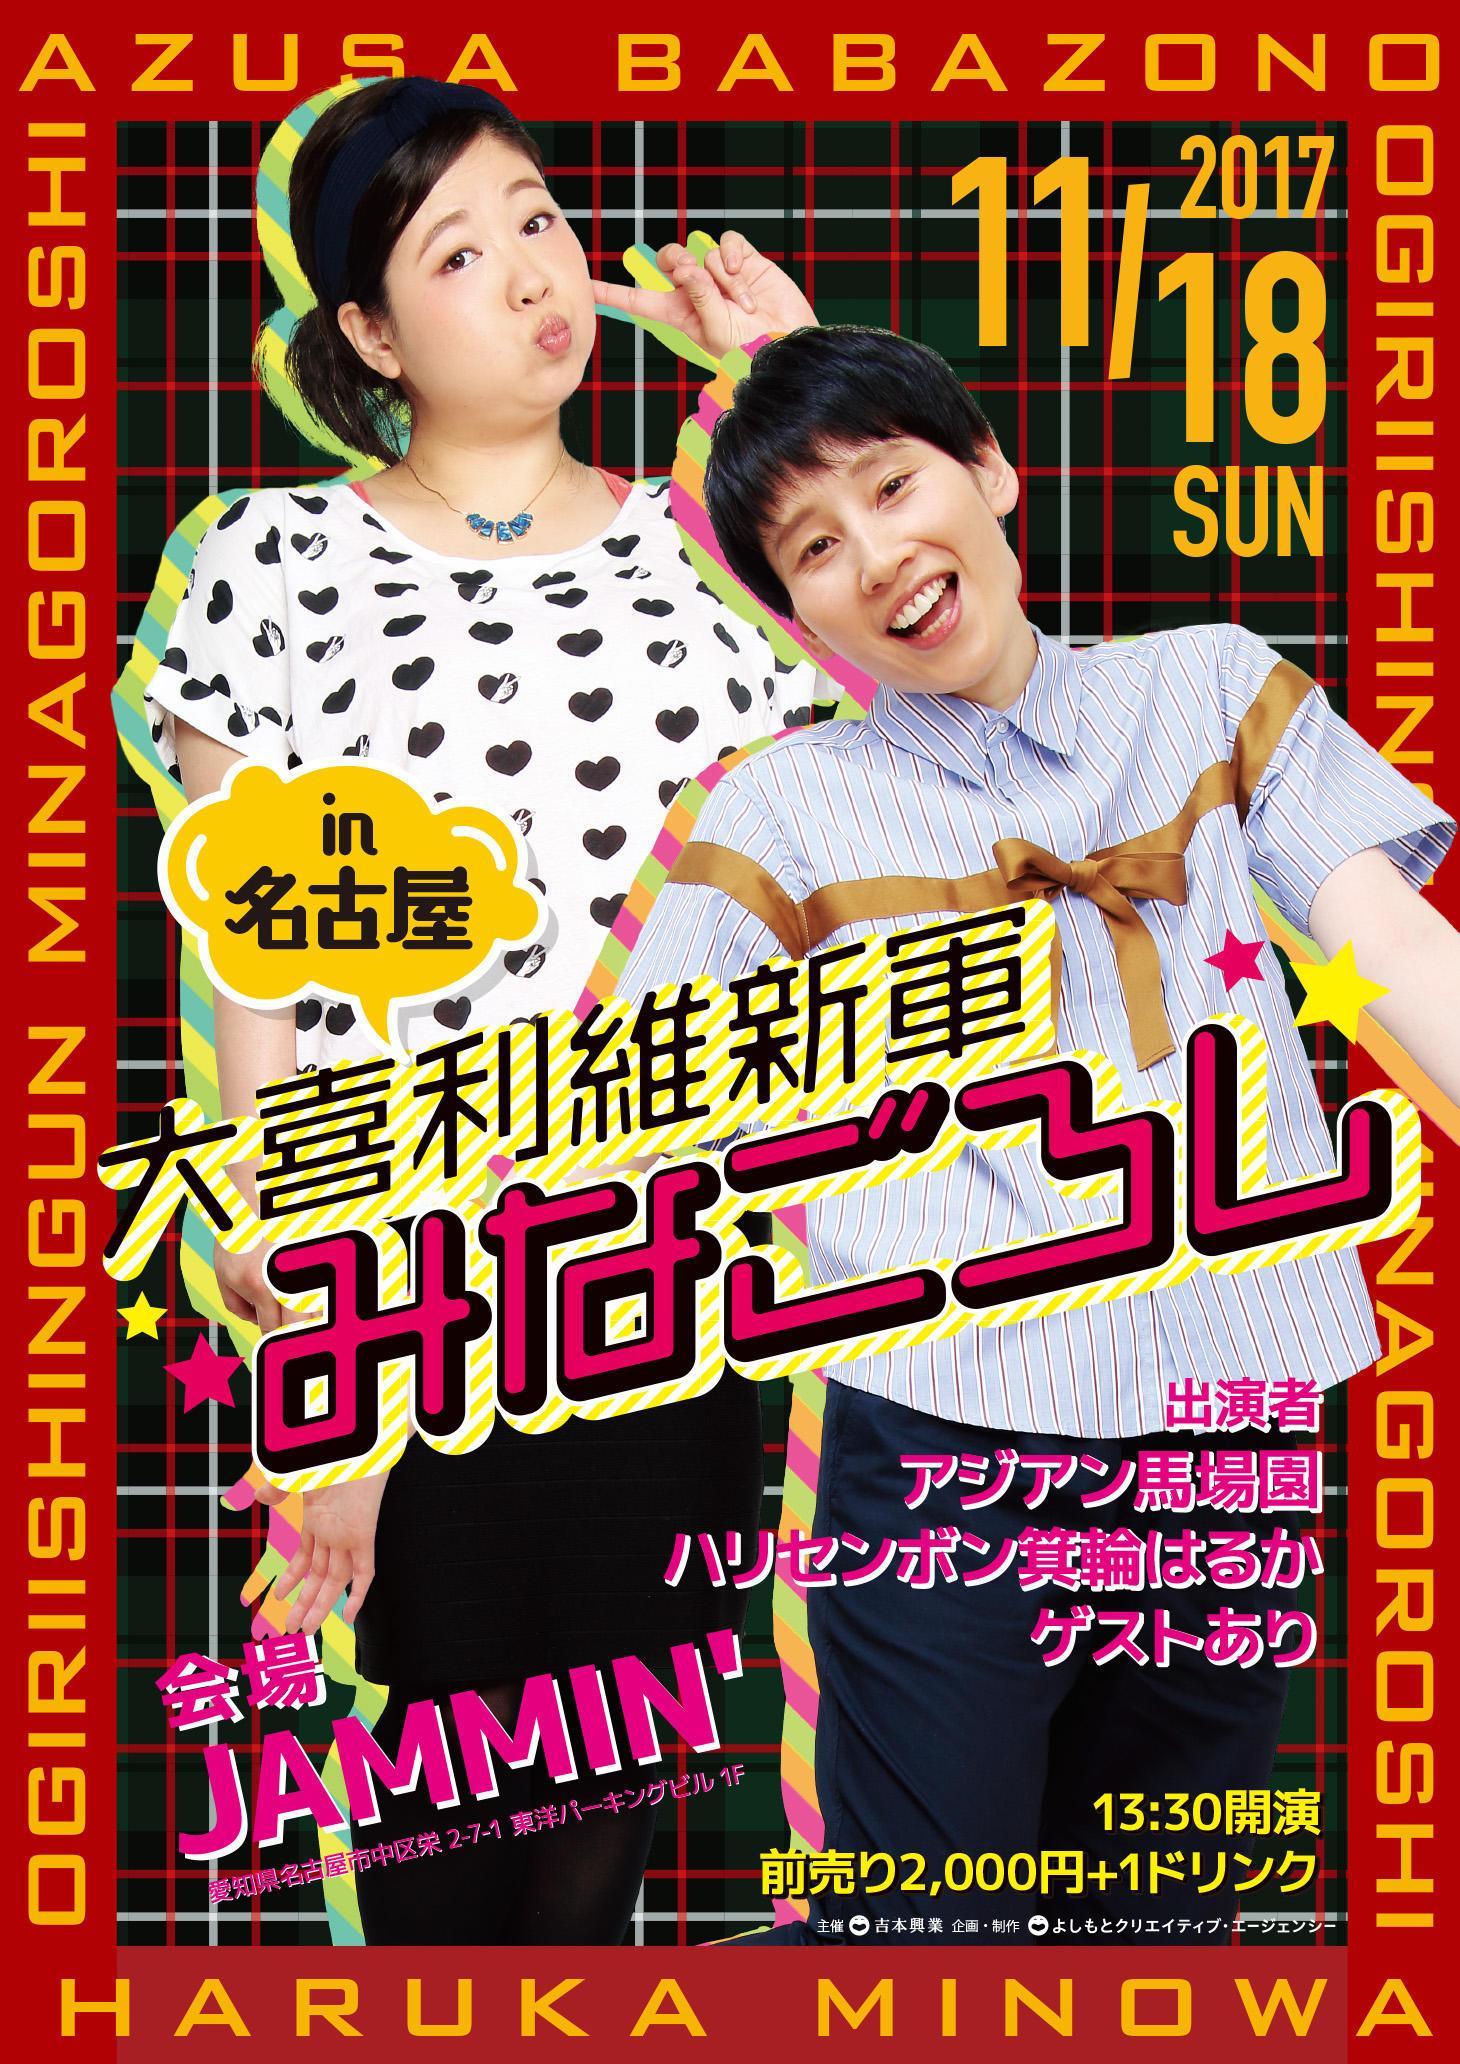 http://news.yoshimoto.co.jp/20171006180956-db6b8a12068b7e8409dc971494018024a2a08f29.jpg